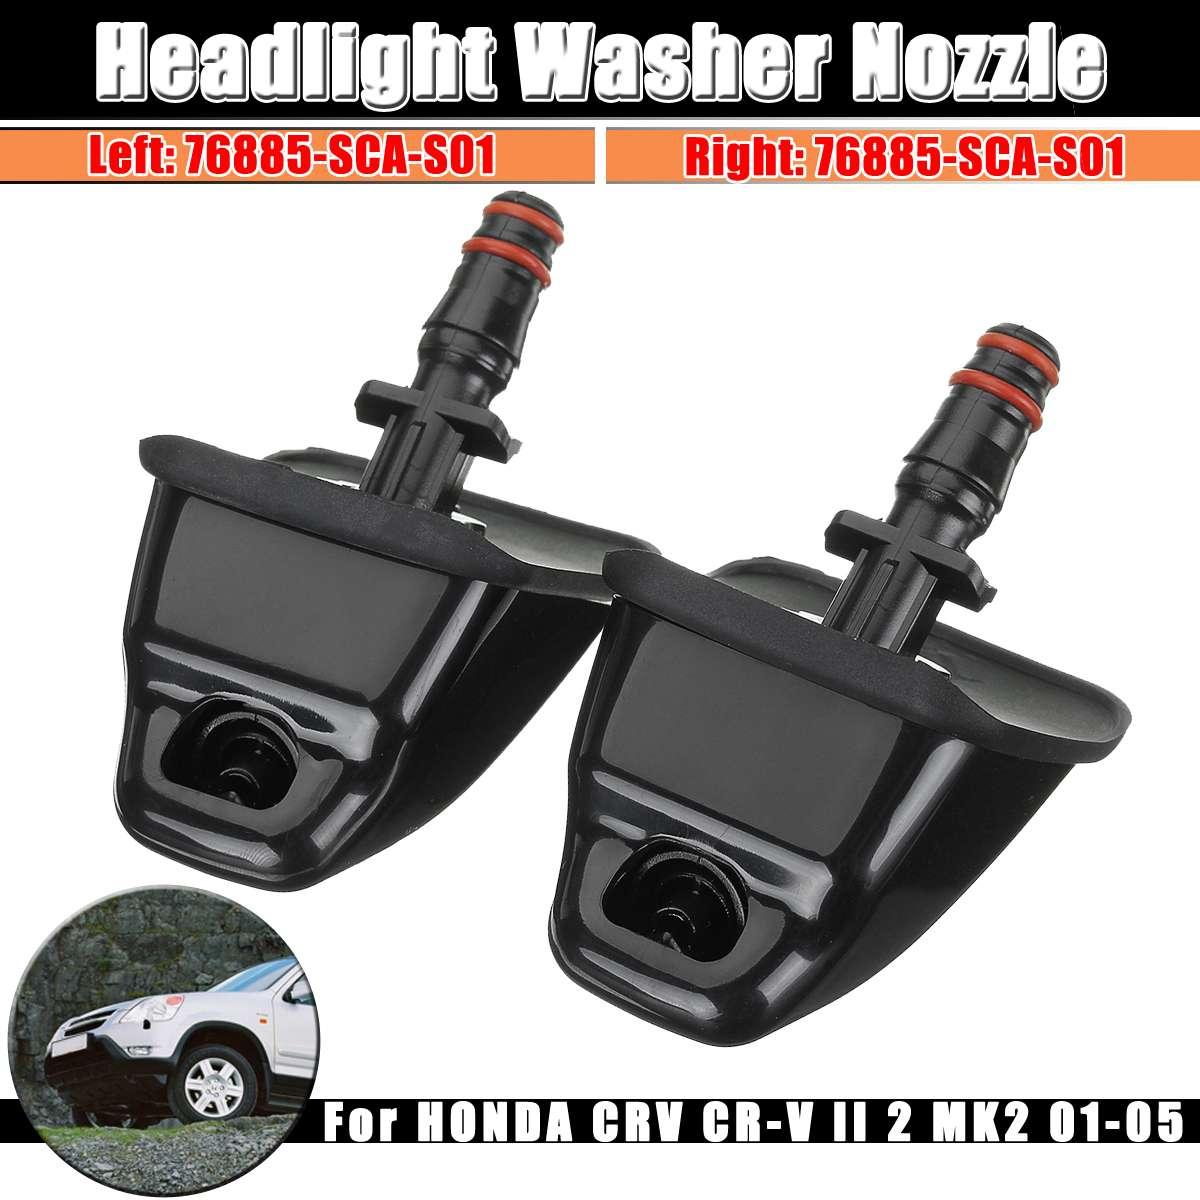 2001-2005 Headlight Washer Right Nozzle 1X 76885-SCA-S01 For Honda CRV CR-V II